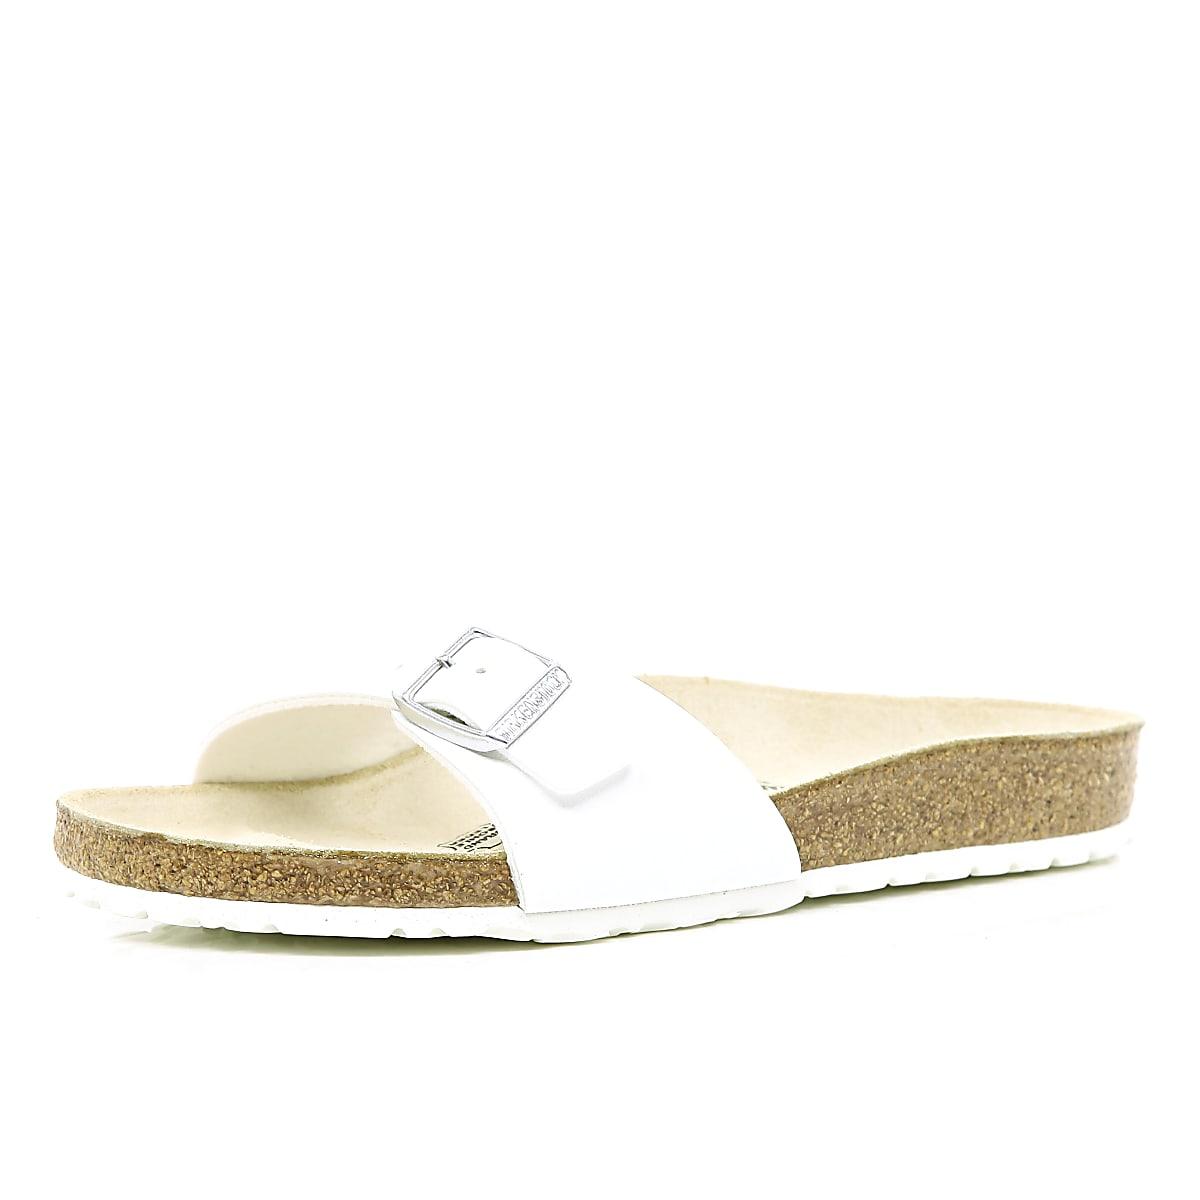 White Birkenstock single strap mule sandals